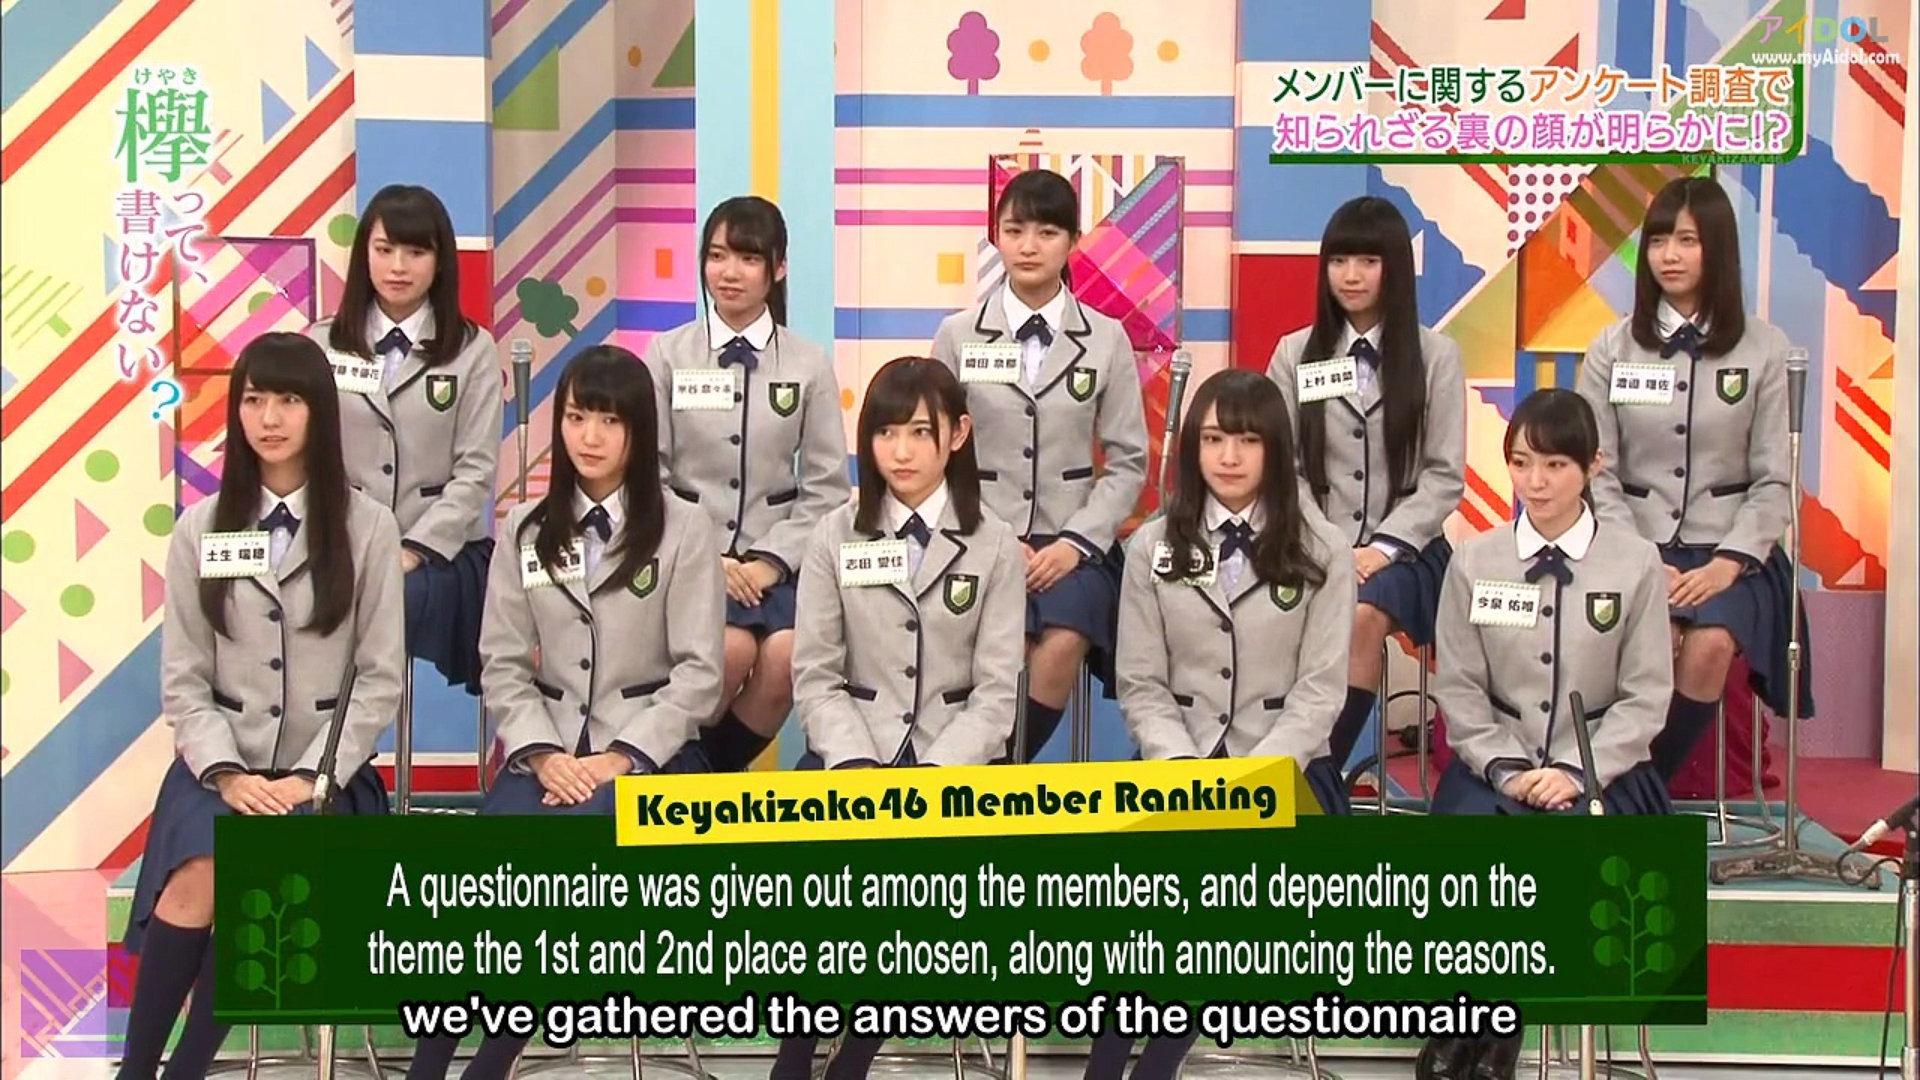 [EP17] Keyakitte, Kakenai?: What's the truth? Member Ranking (English Sub)